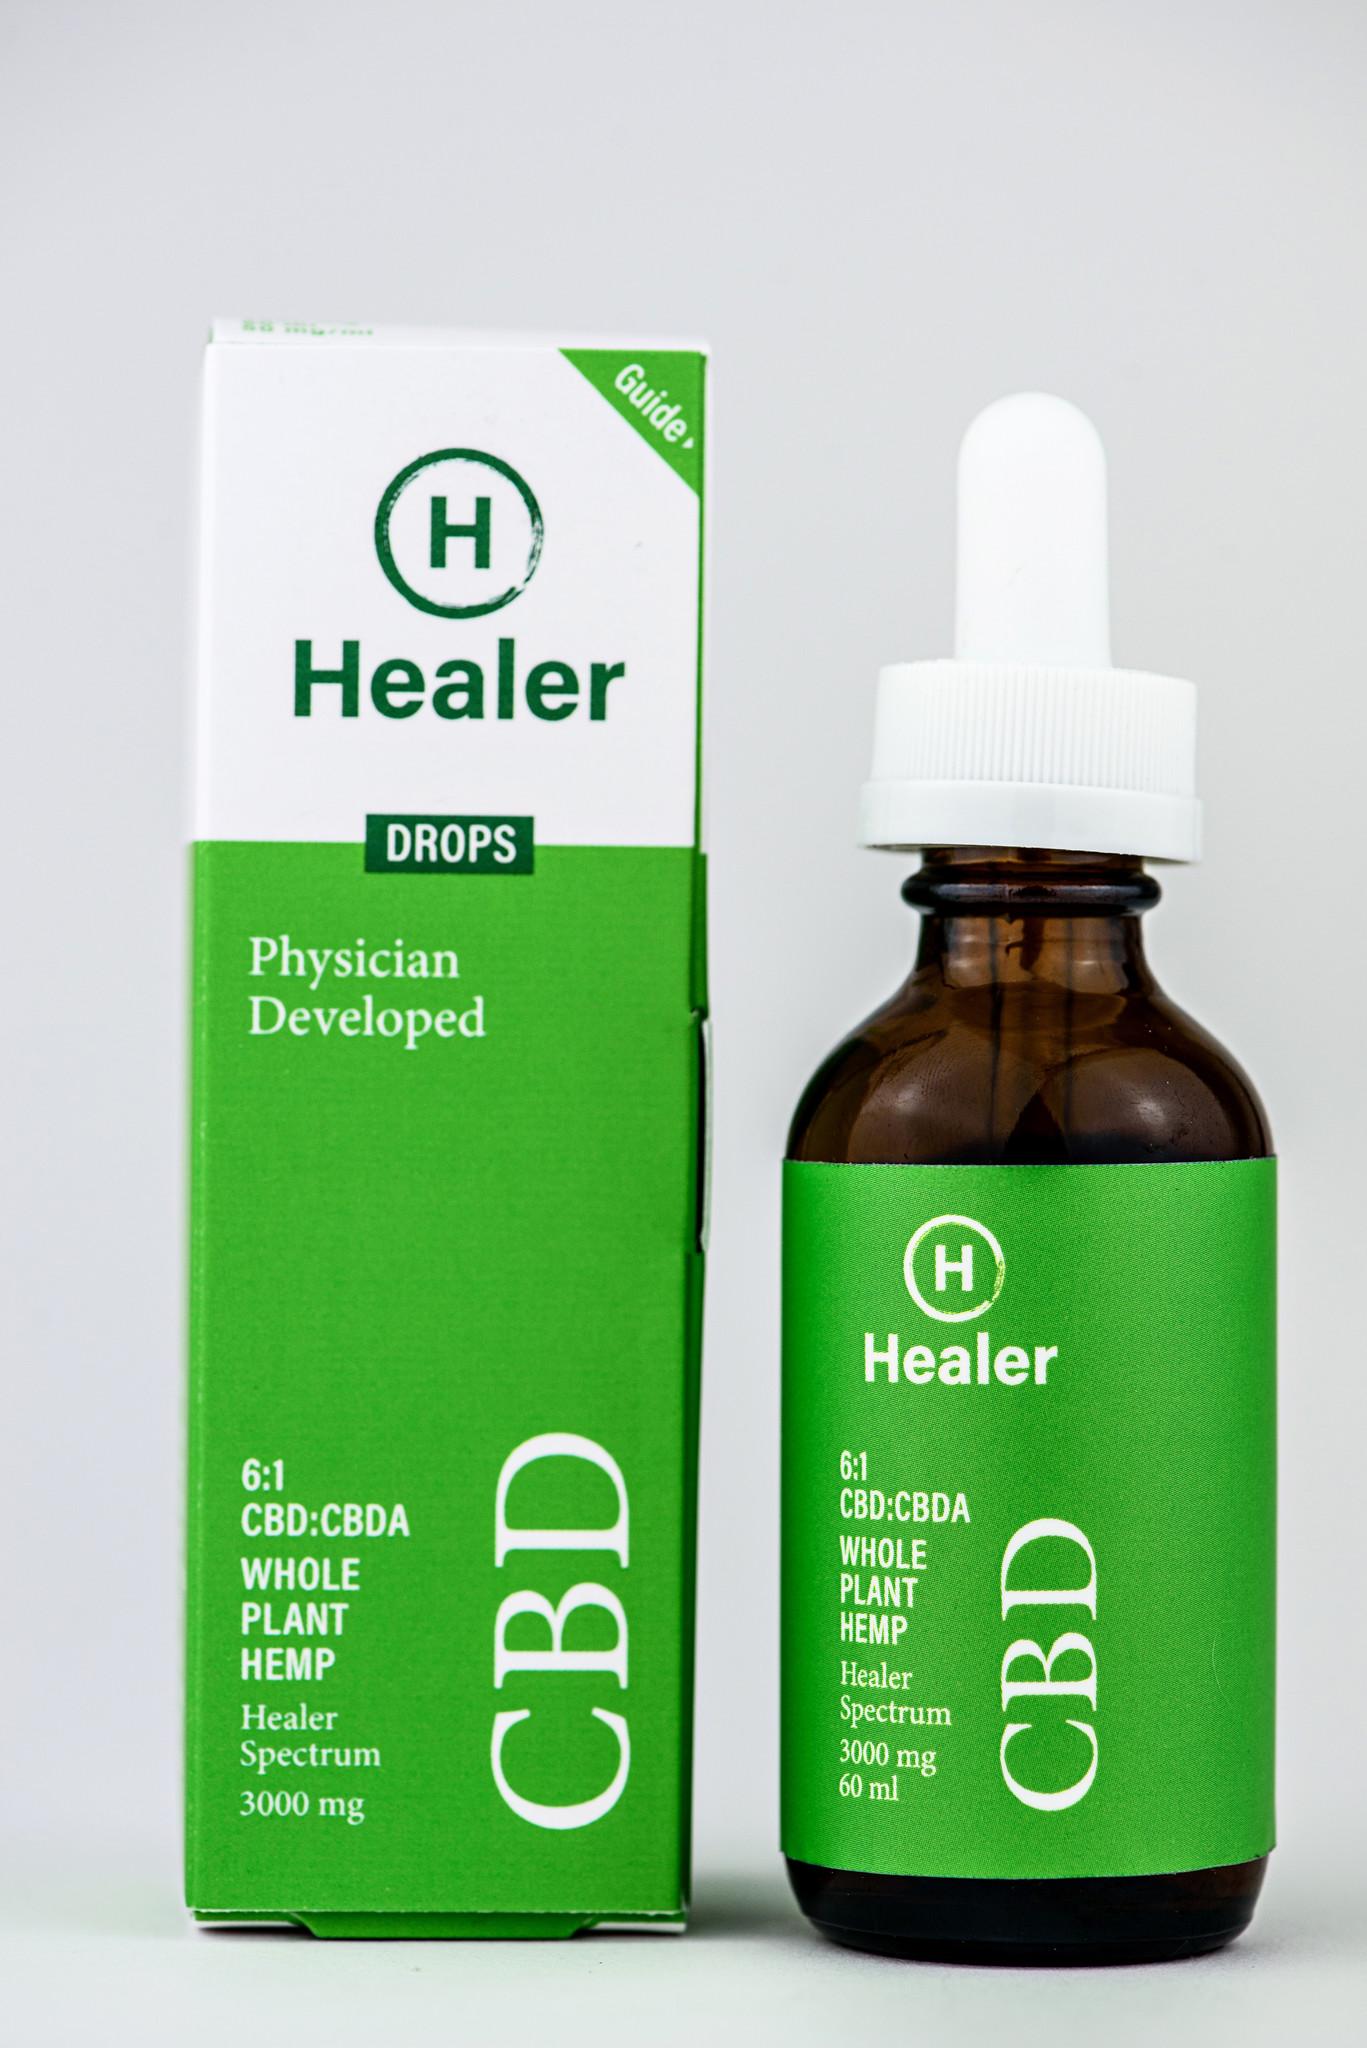 Healer   HEALER   CBD:CBDA 6:1   4 OPTIONS